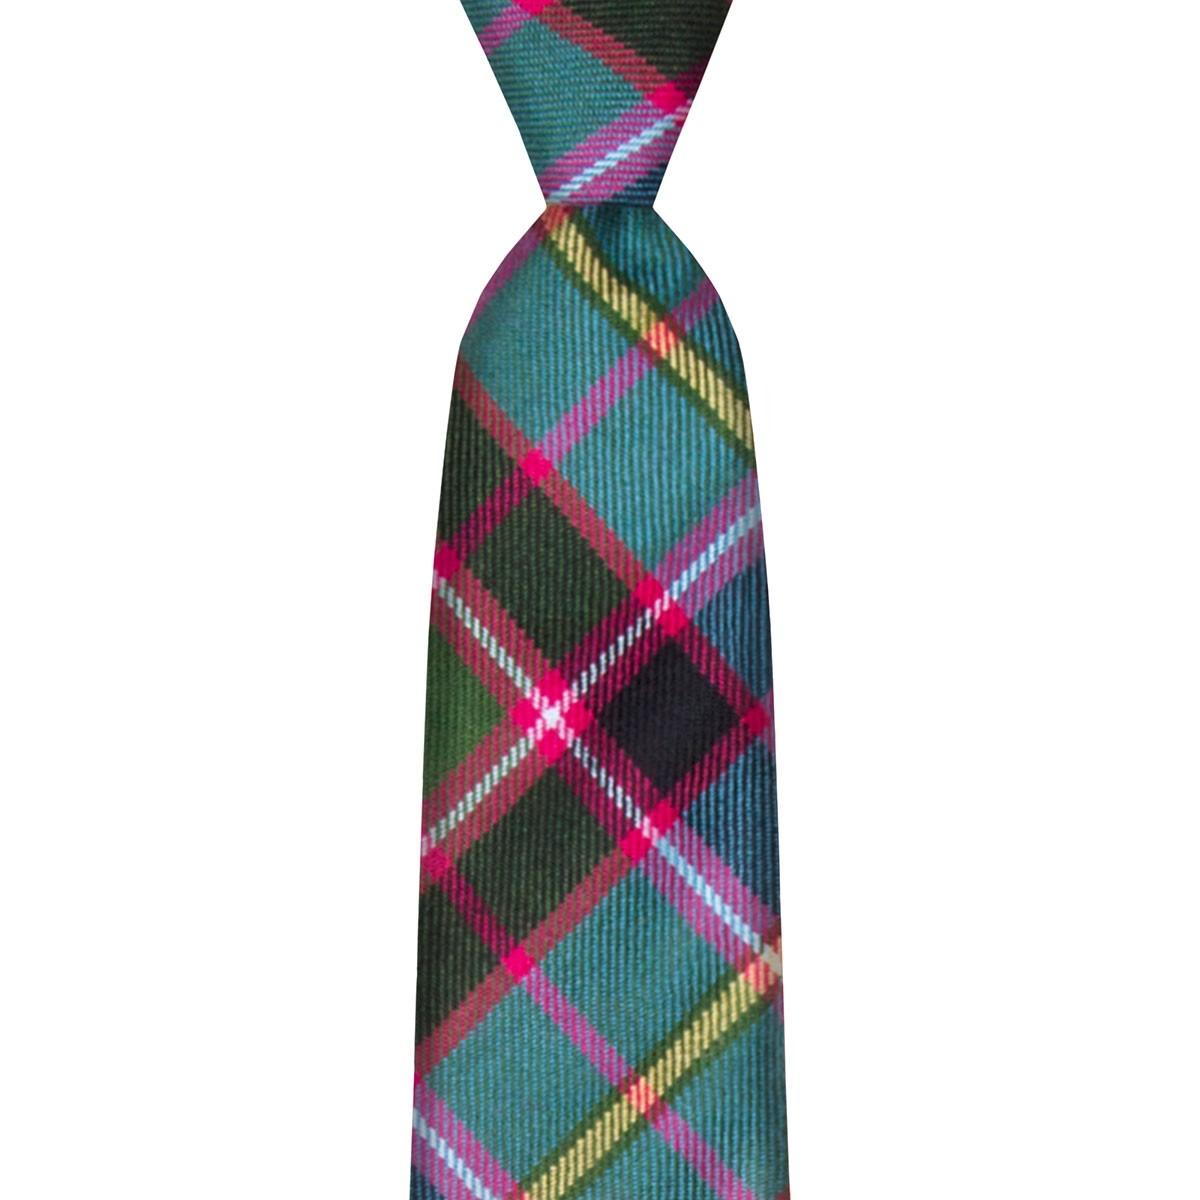 Stirling & Bannockburn Tartan Tie